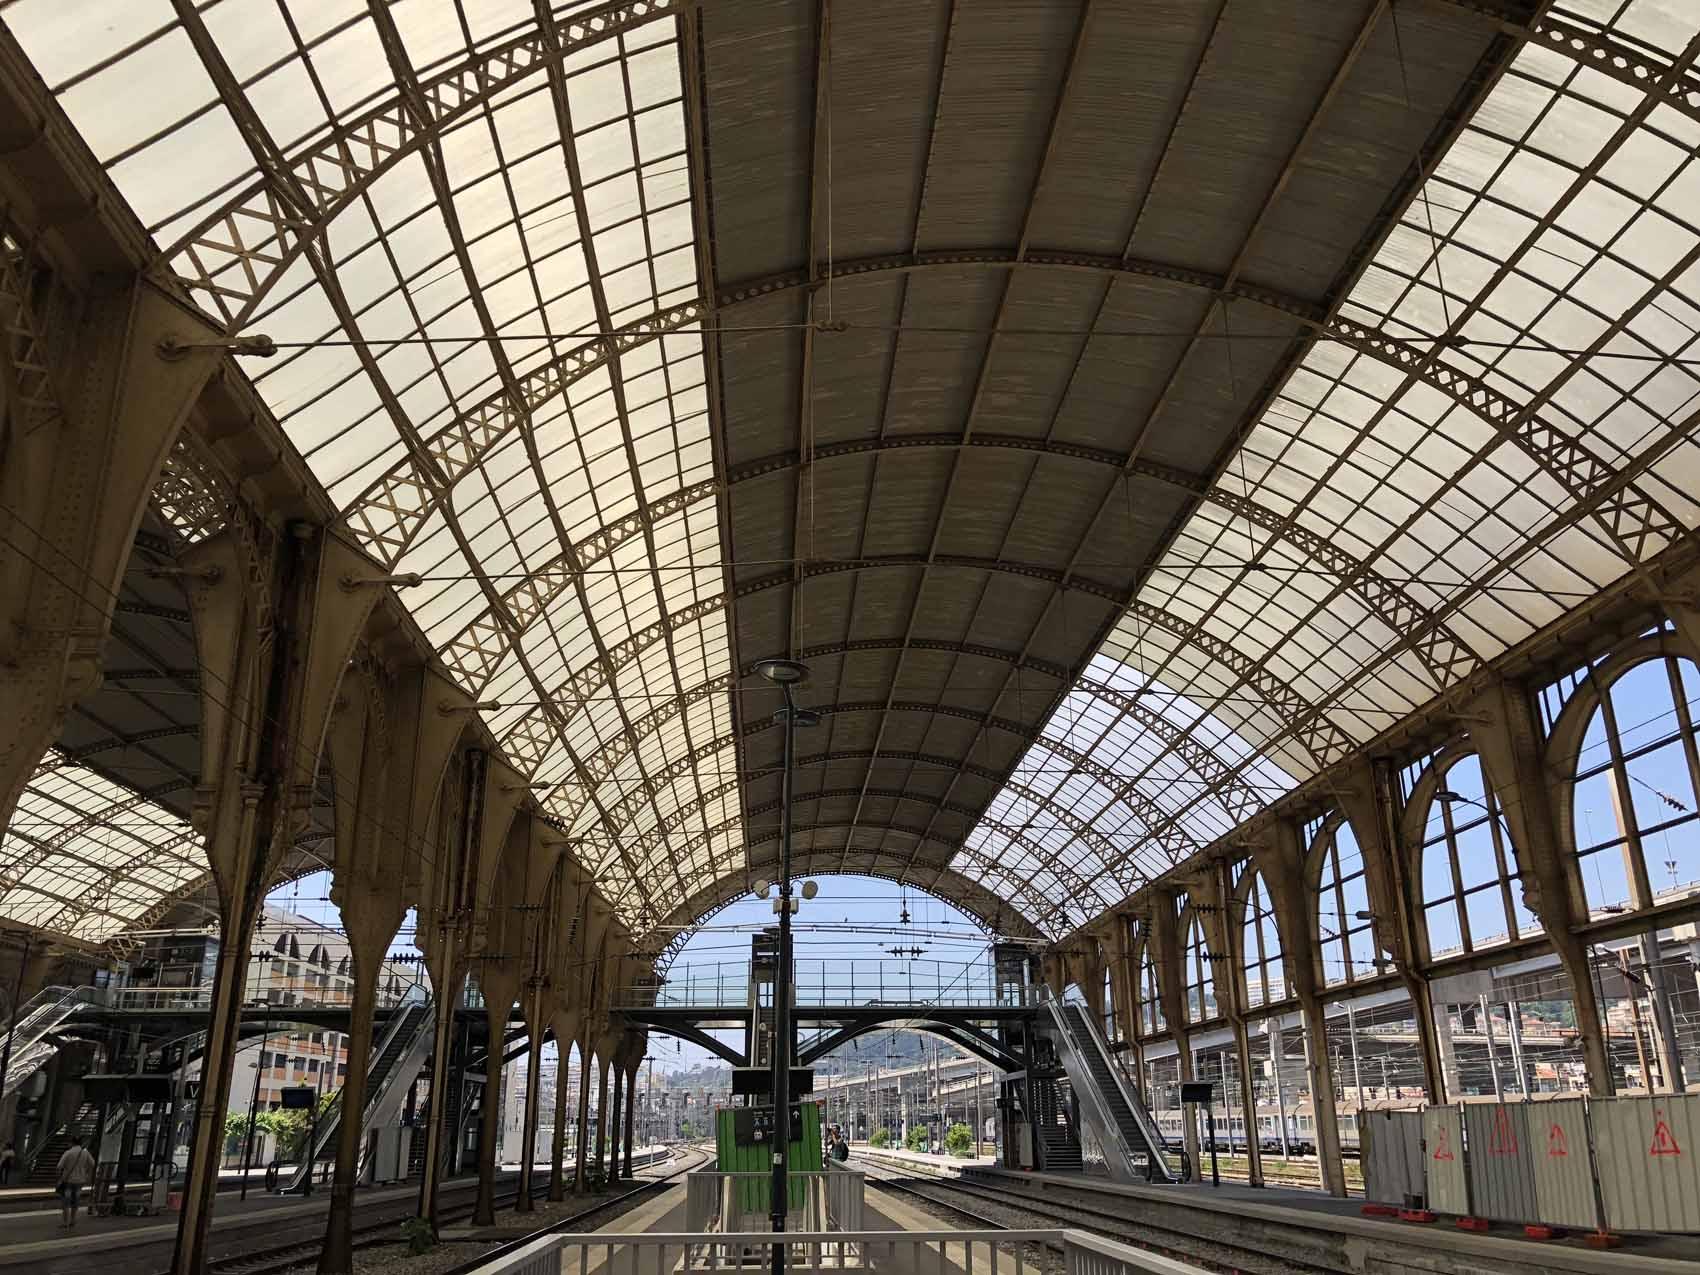 Nizzan rautatieasema